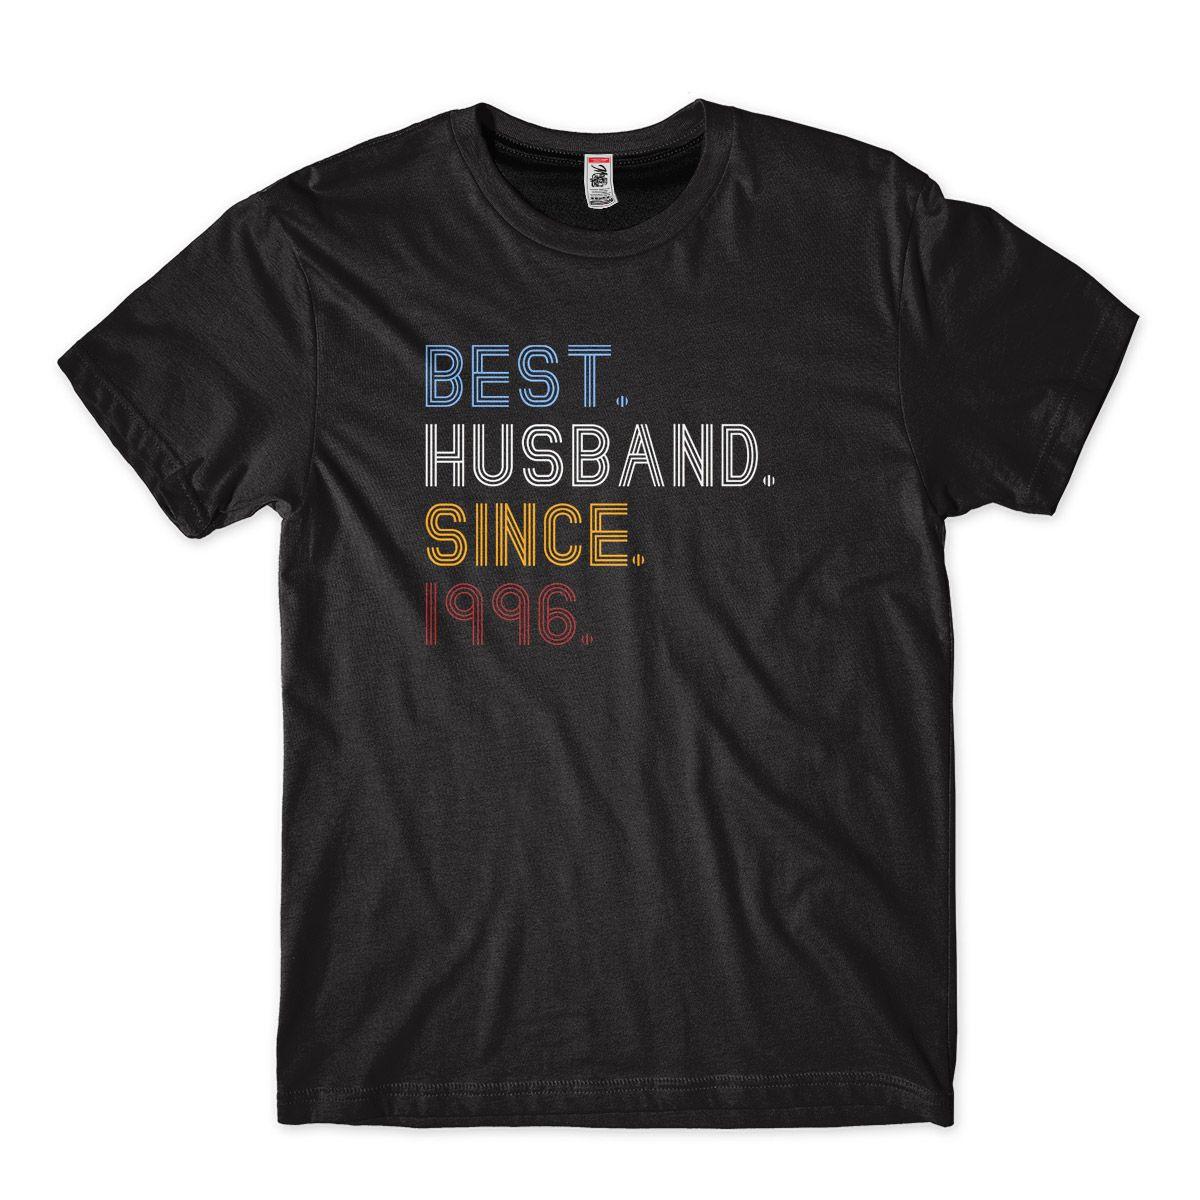 camisa personalizada para aniversario do marido